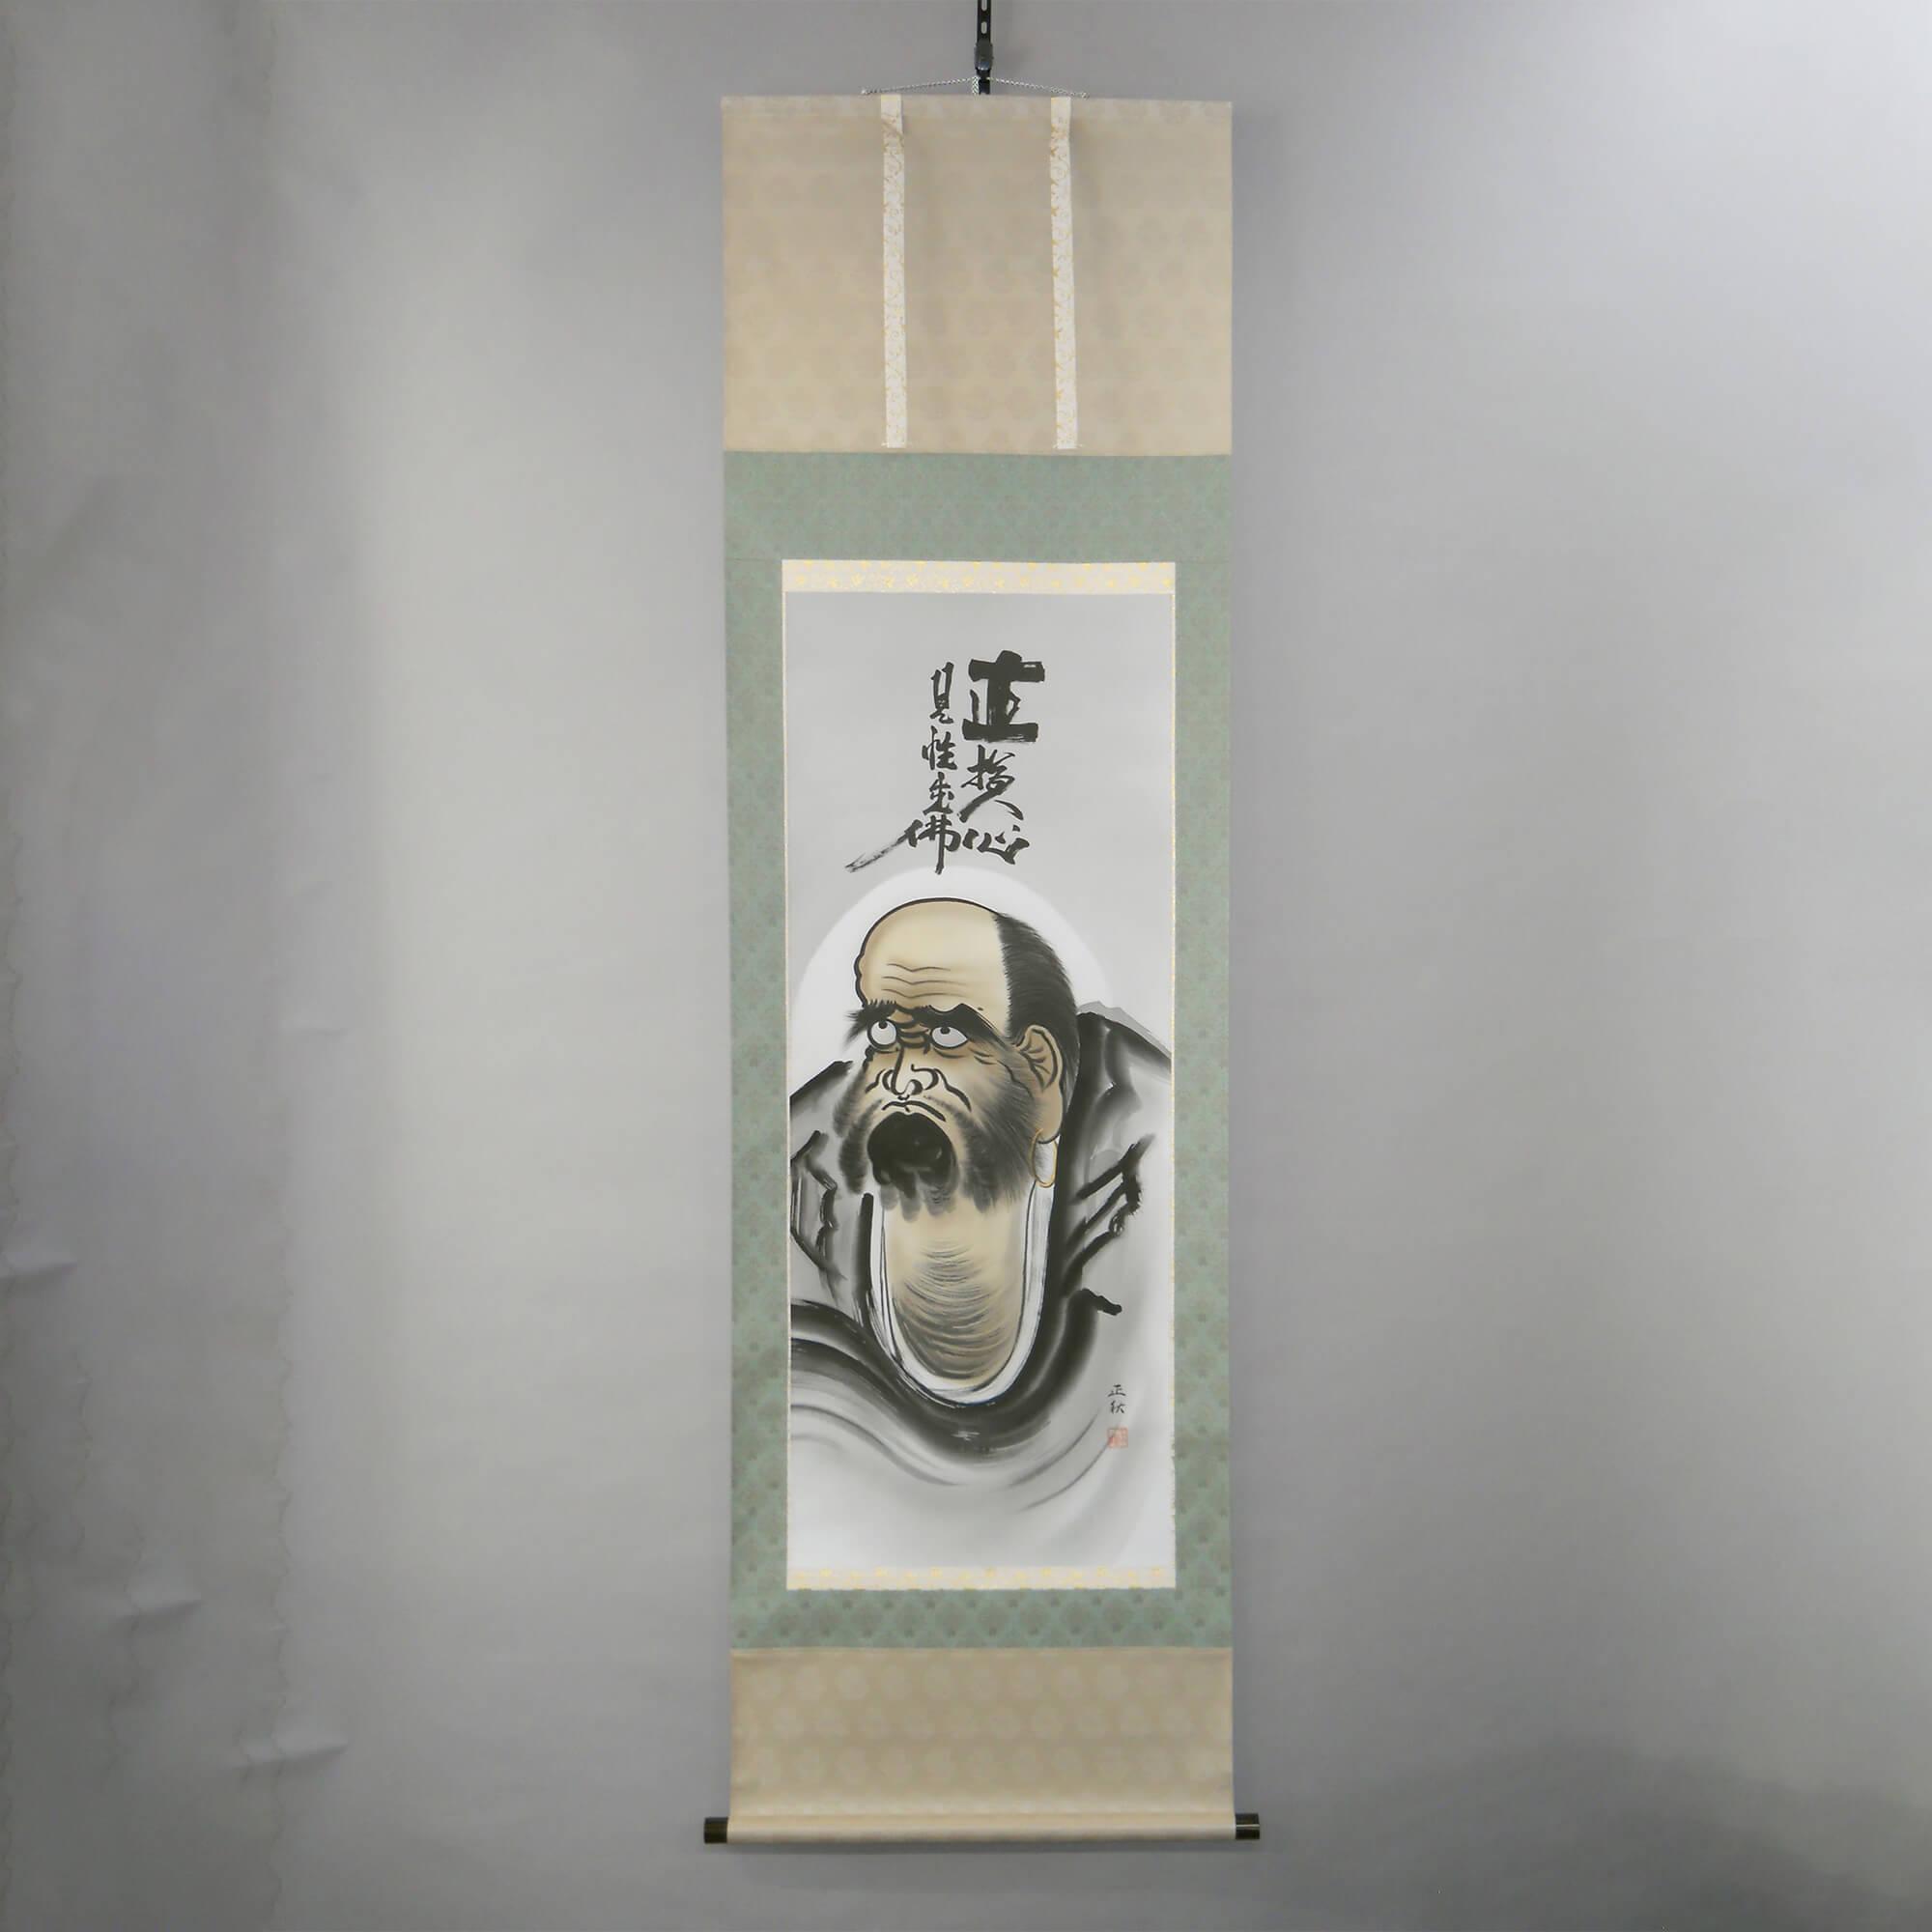 Bodhidharma / Masaaki Tanaka